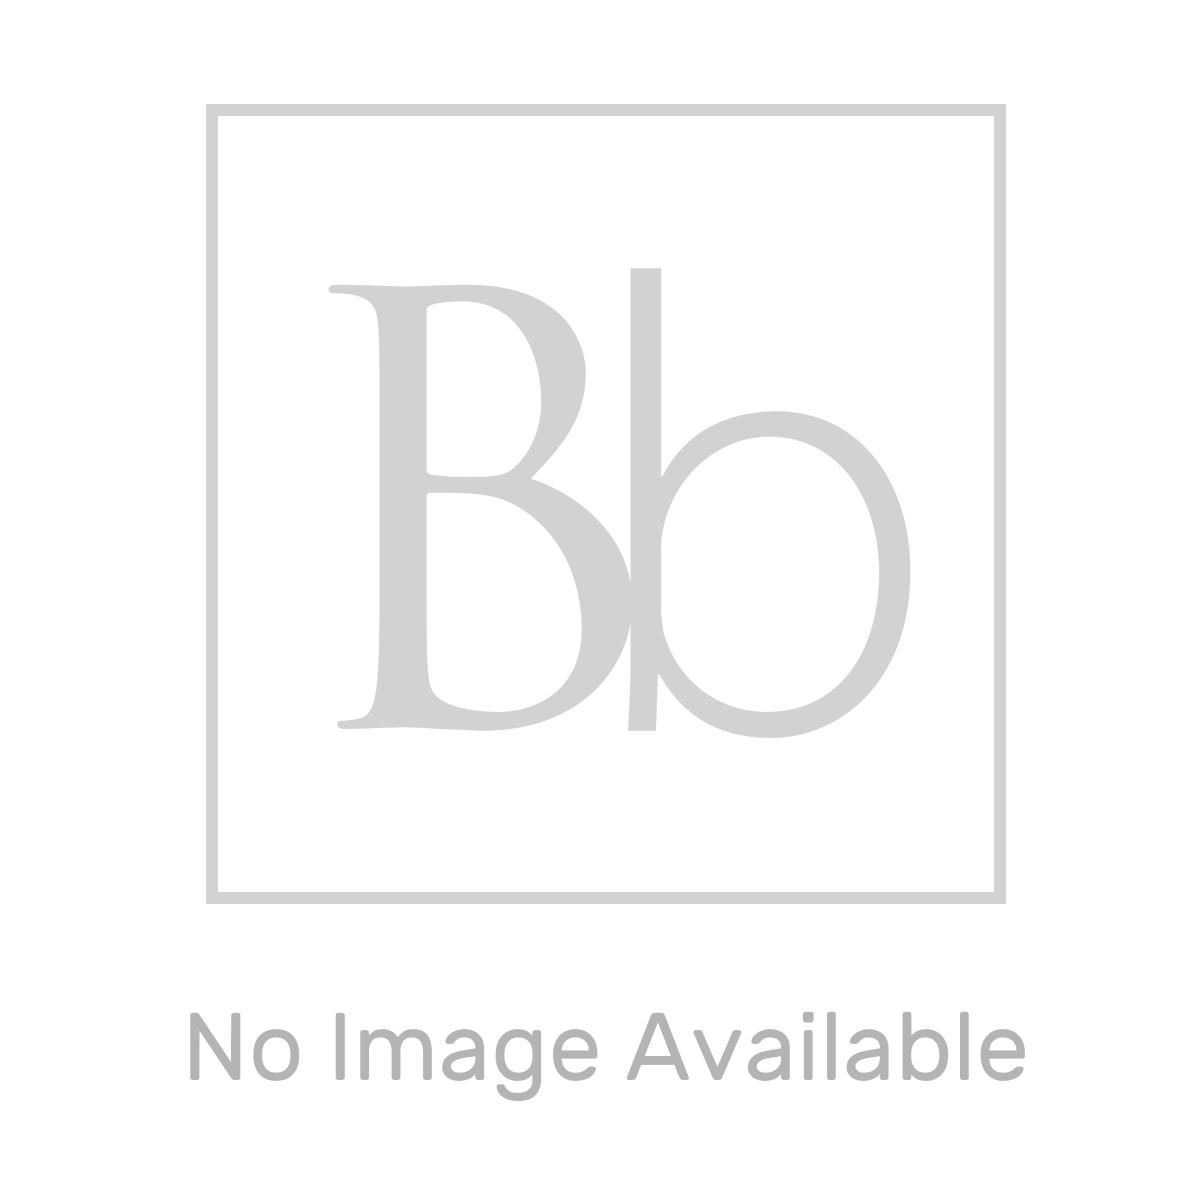 Aquadart White Slate Shower Tray 1600 x 800 Lifestyle